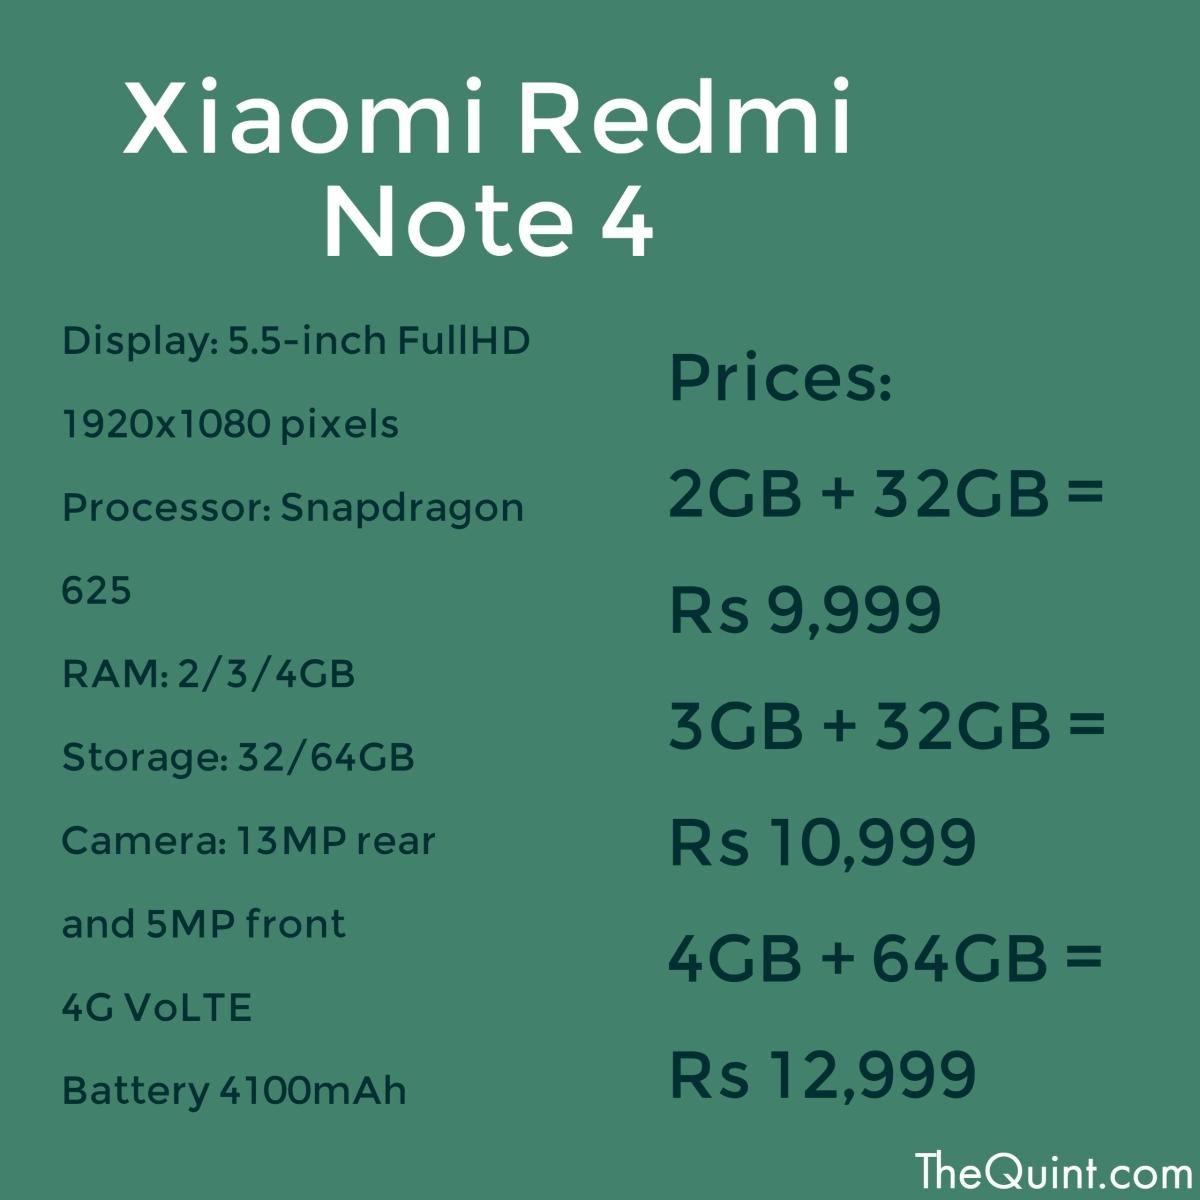 Power Punch: Xiaomi Redmi Note 4 Vs Lenovo K6 Power - The Quint